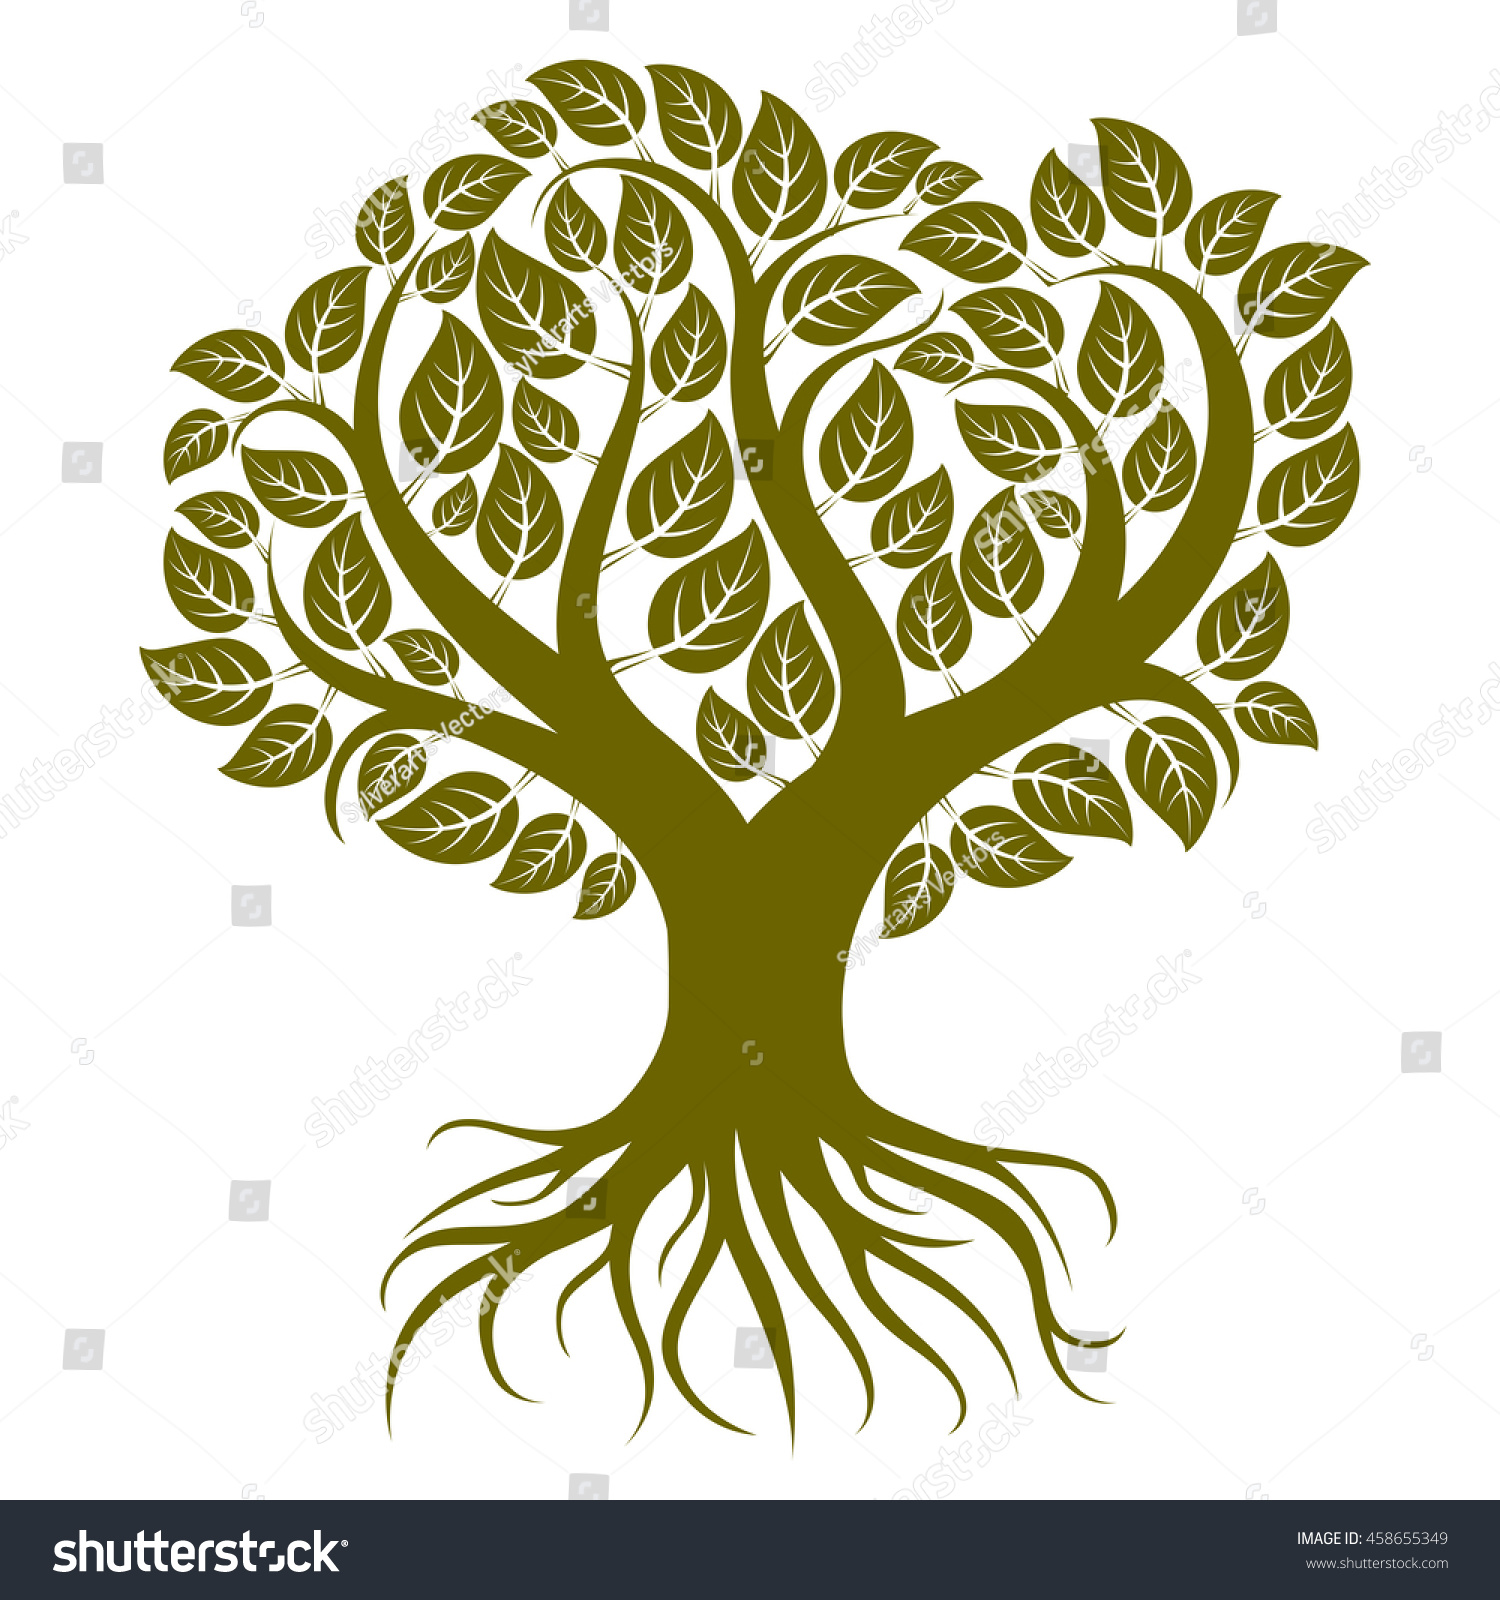 Art Illustration Branchy Tree Strong Roots Stock Illustration